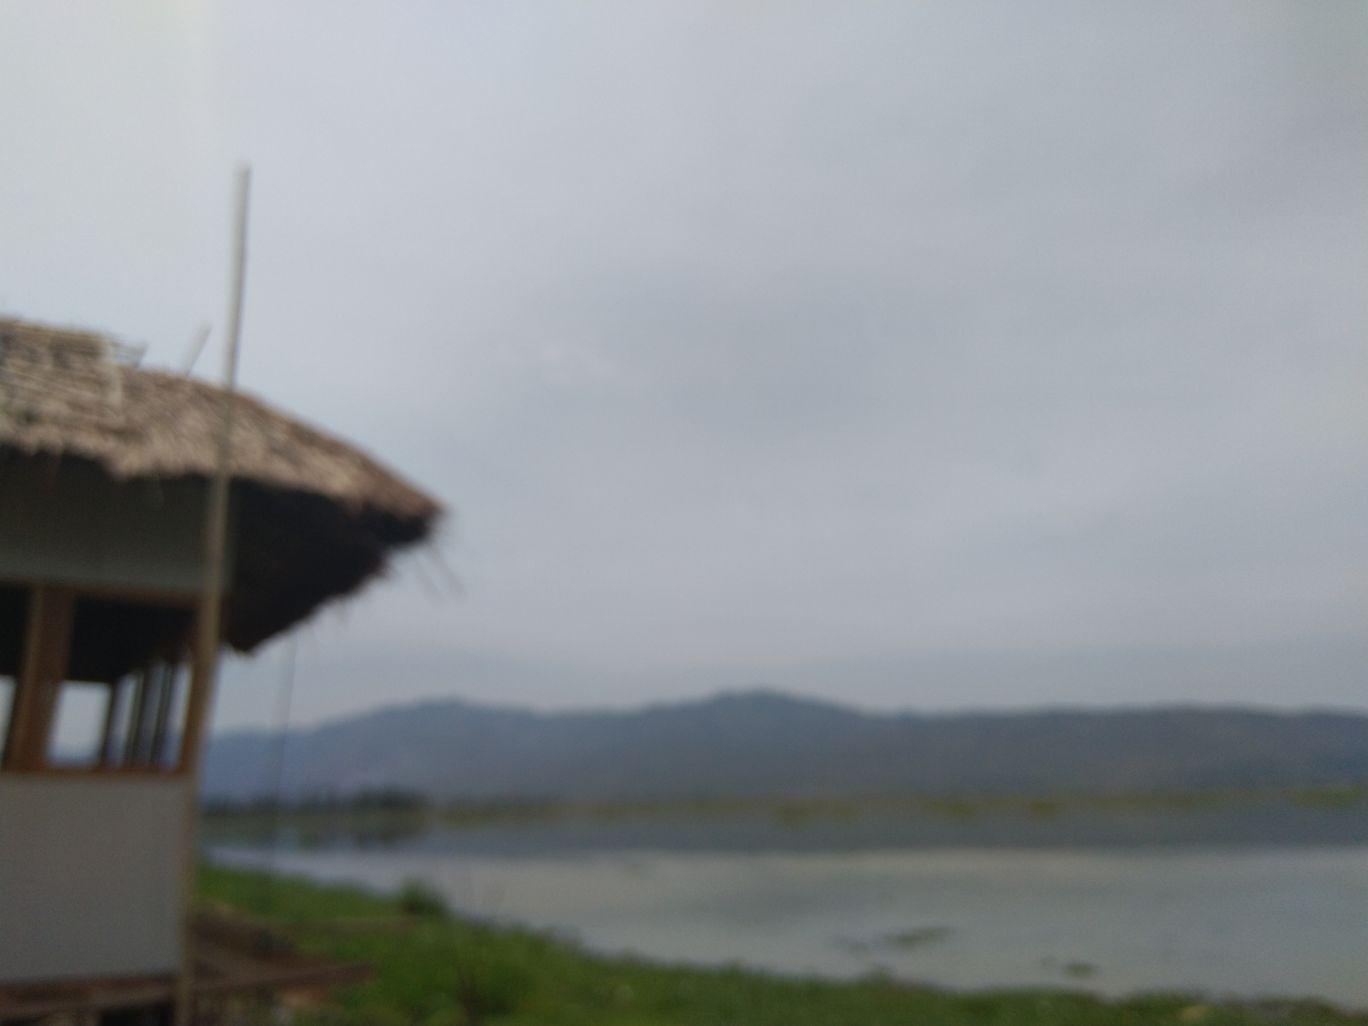 Photo of Northeast India By Rinki Popli